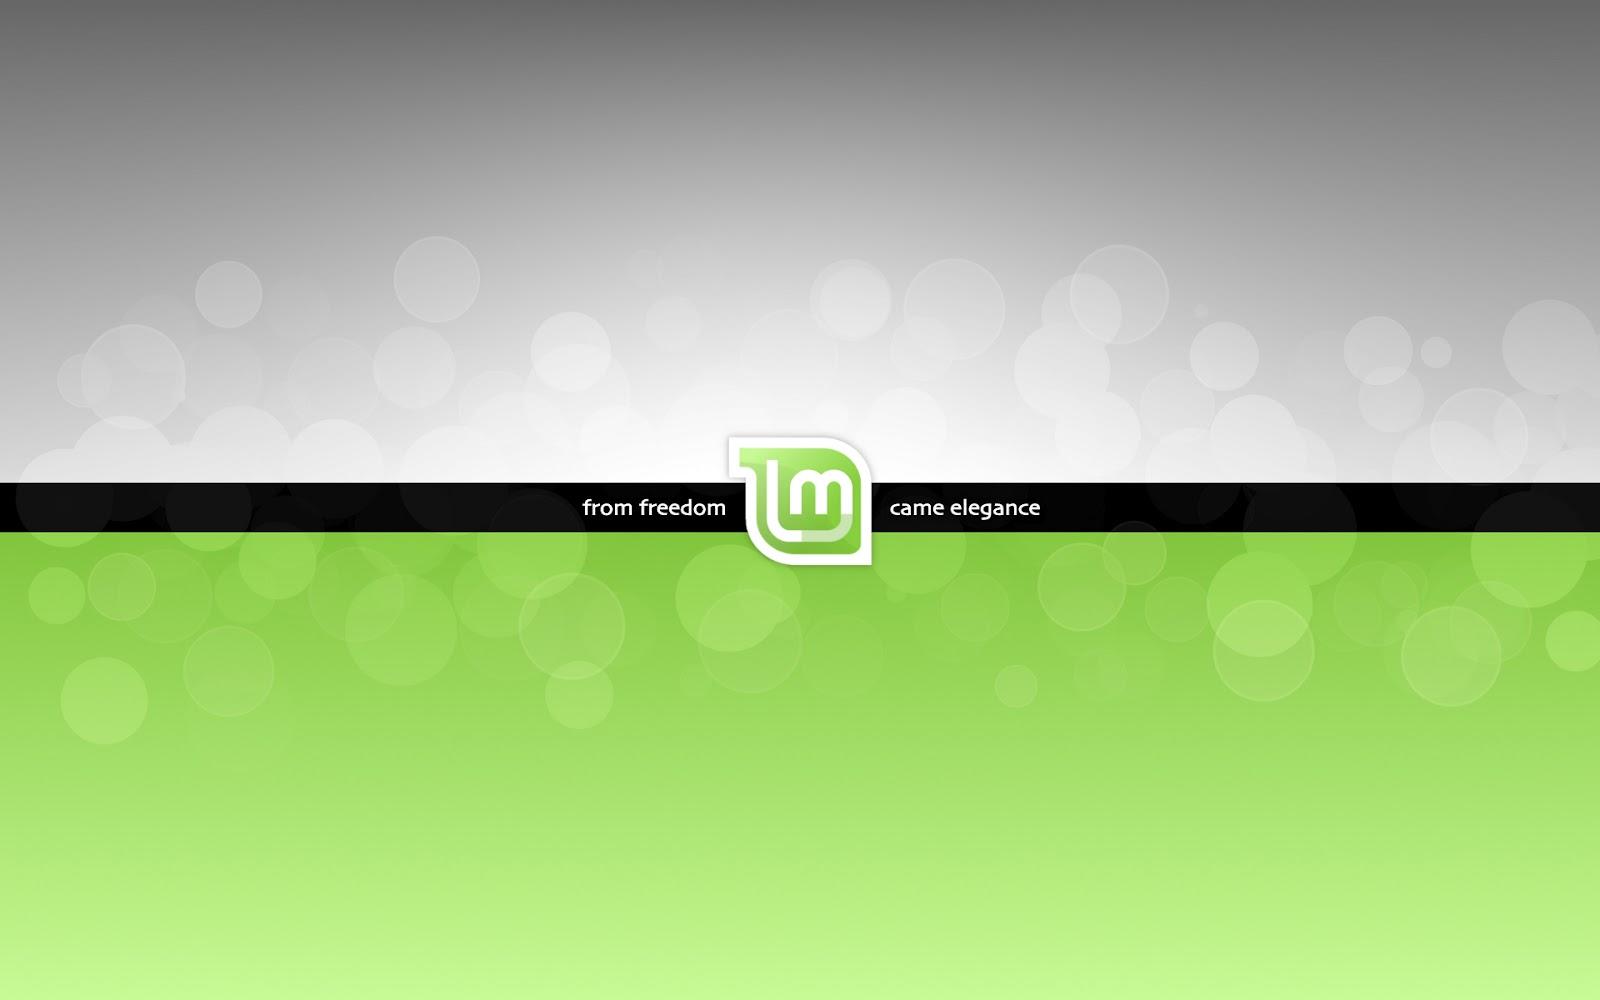 yourwallpapers0 blogsp linux mint wallpaper 3 linux mint wallpaper 3 1600x1000